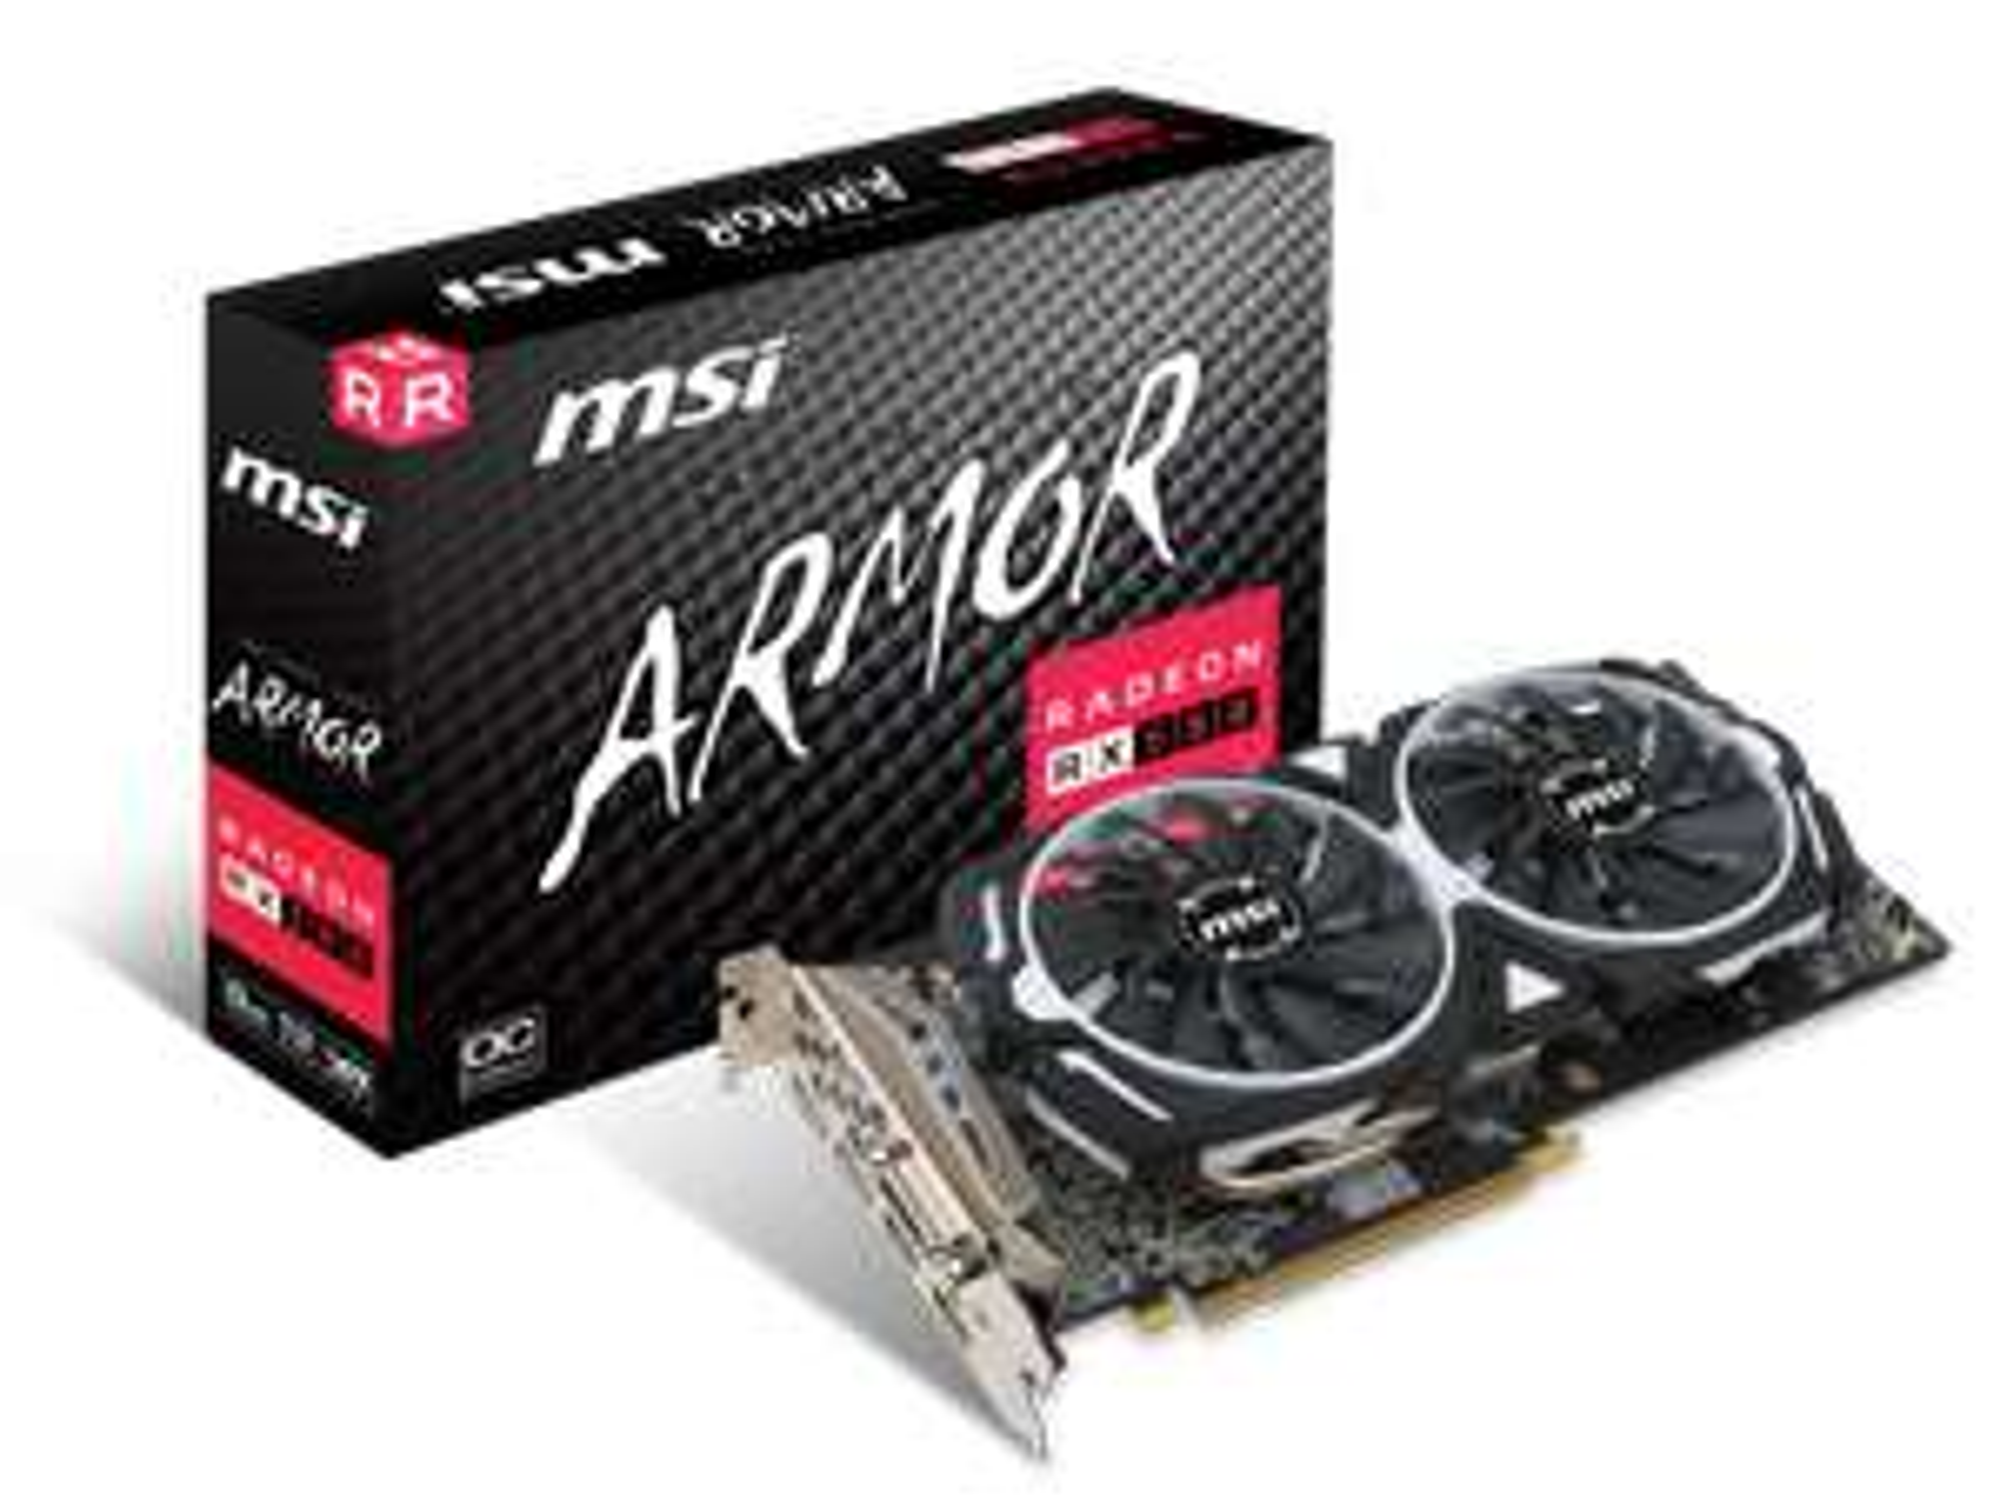 MSI ARMOR RX 580 8gb + 5 euro Versand